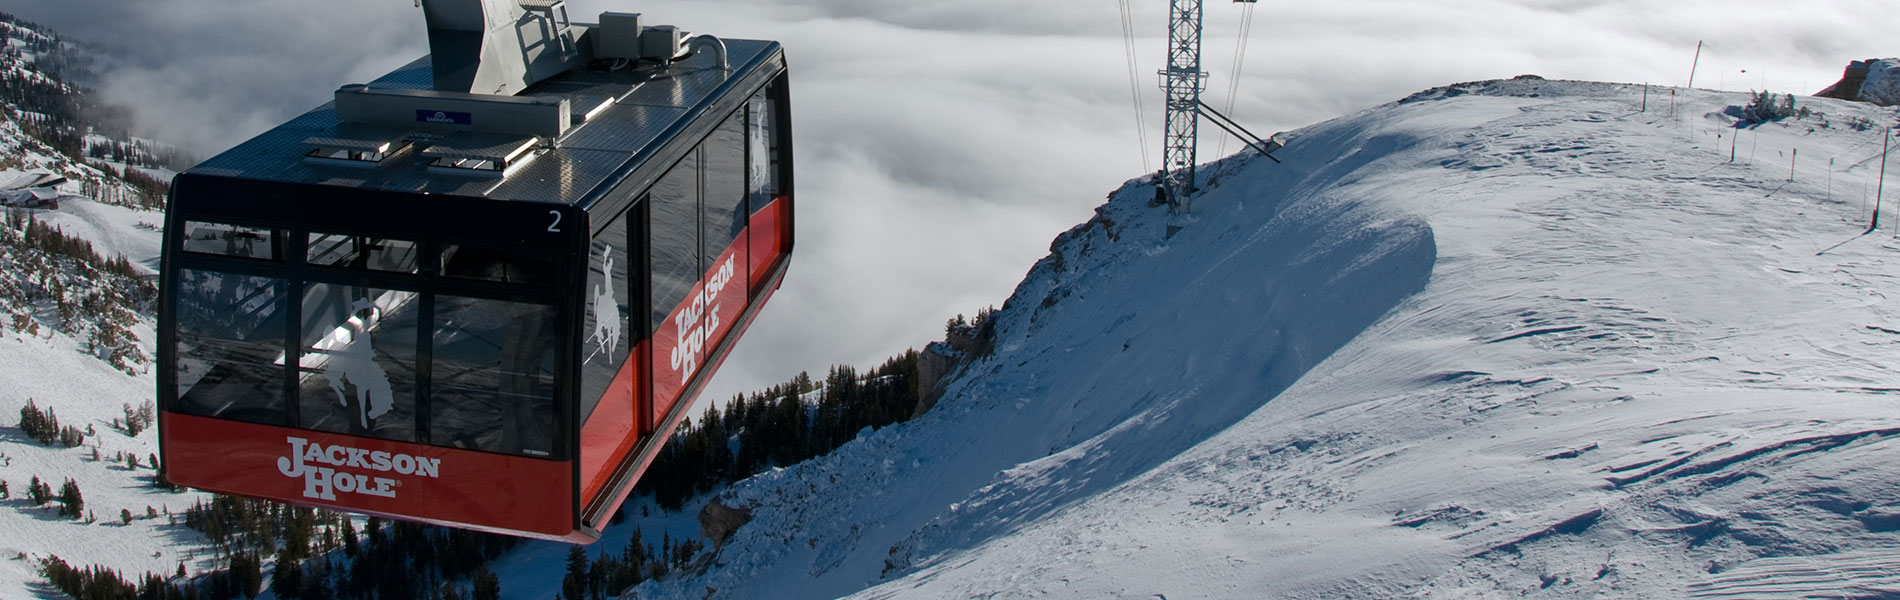 Jackson Hole gondola on mountain top